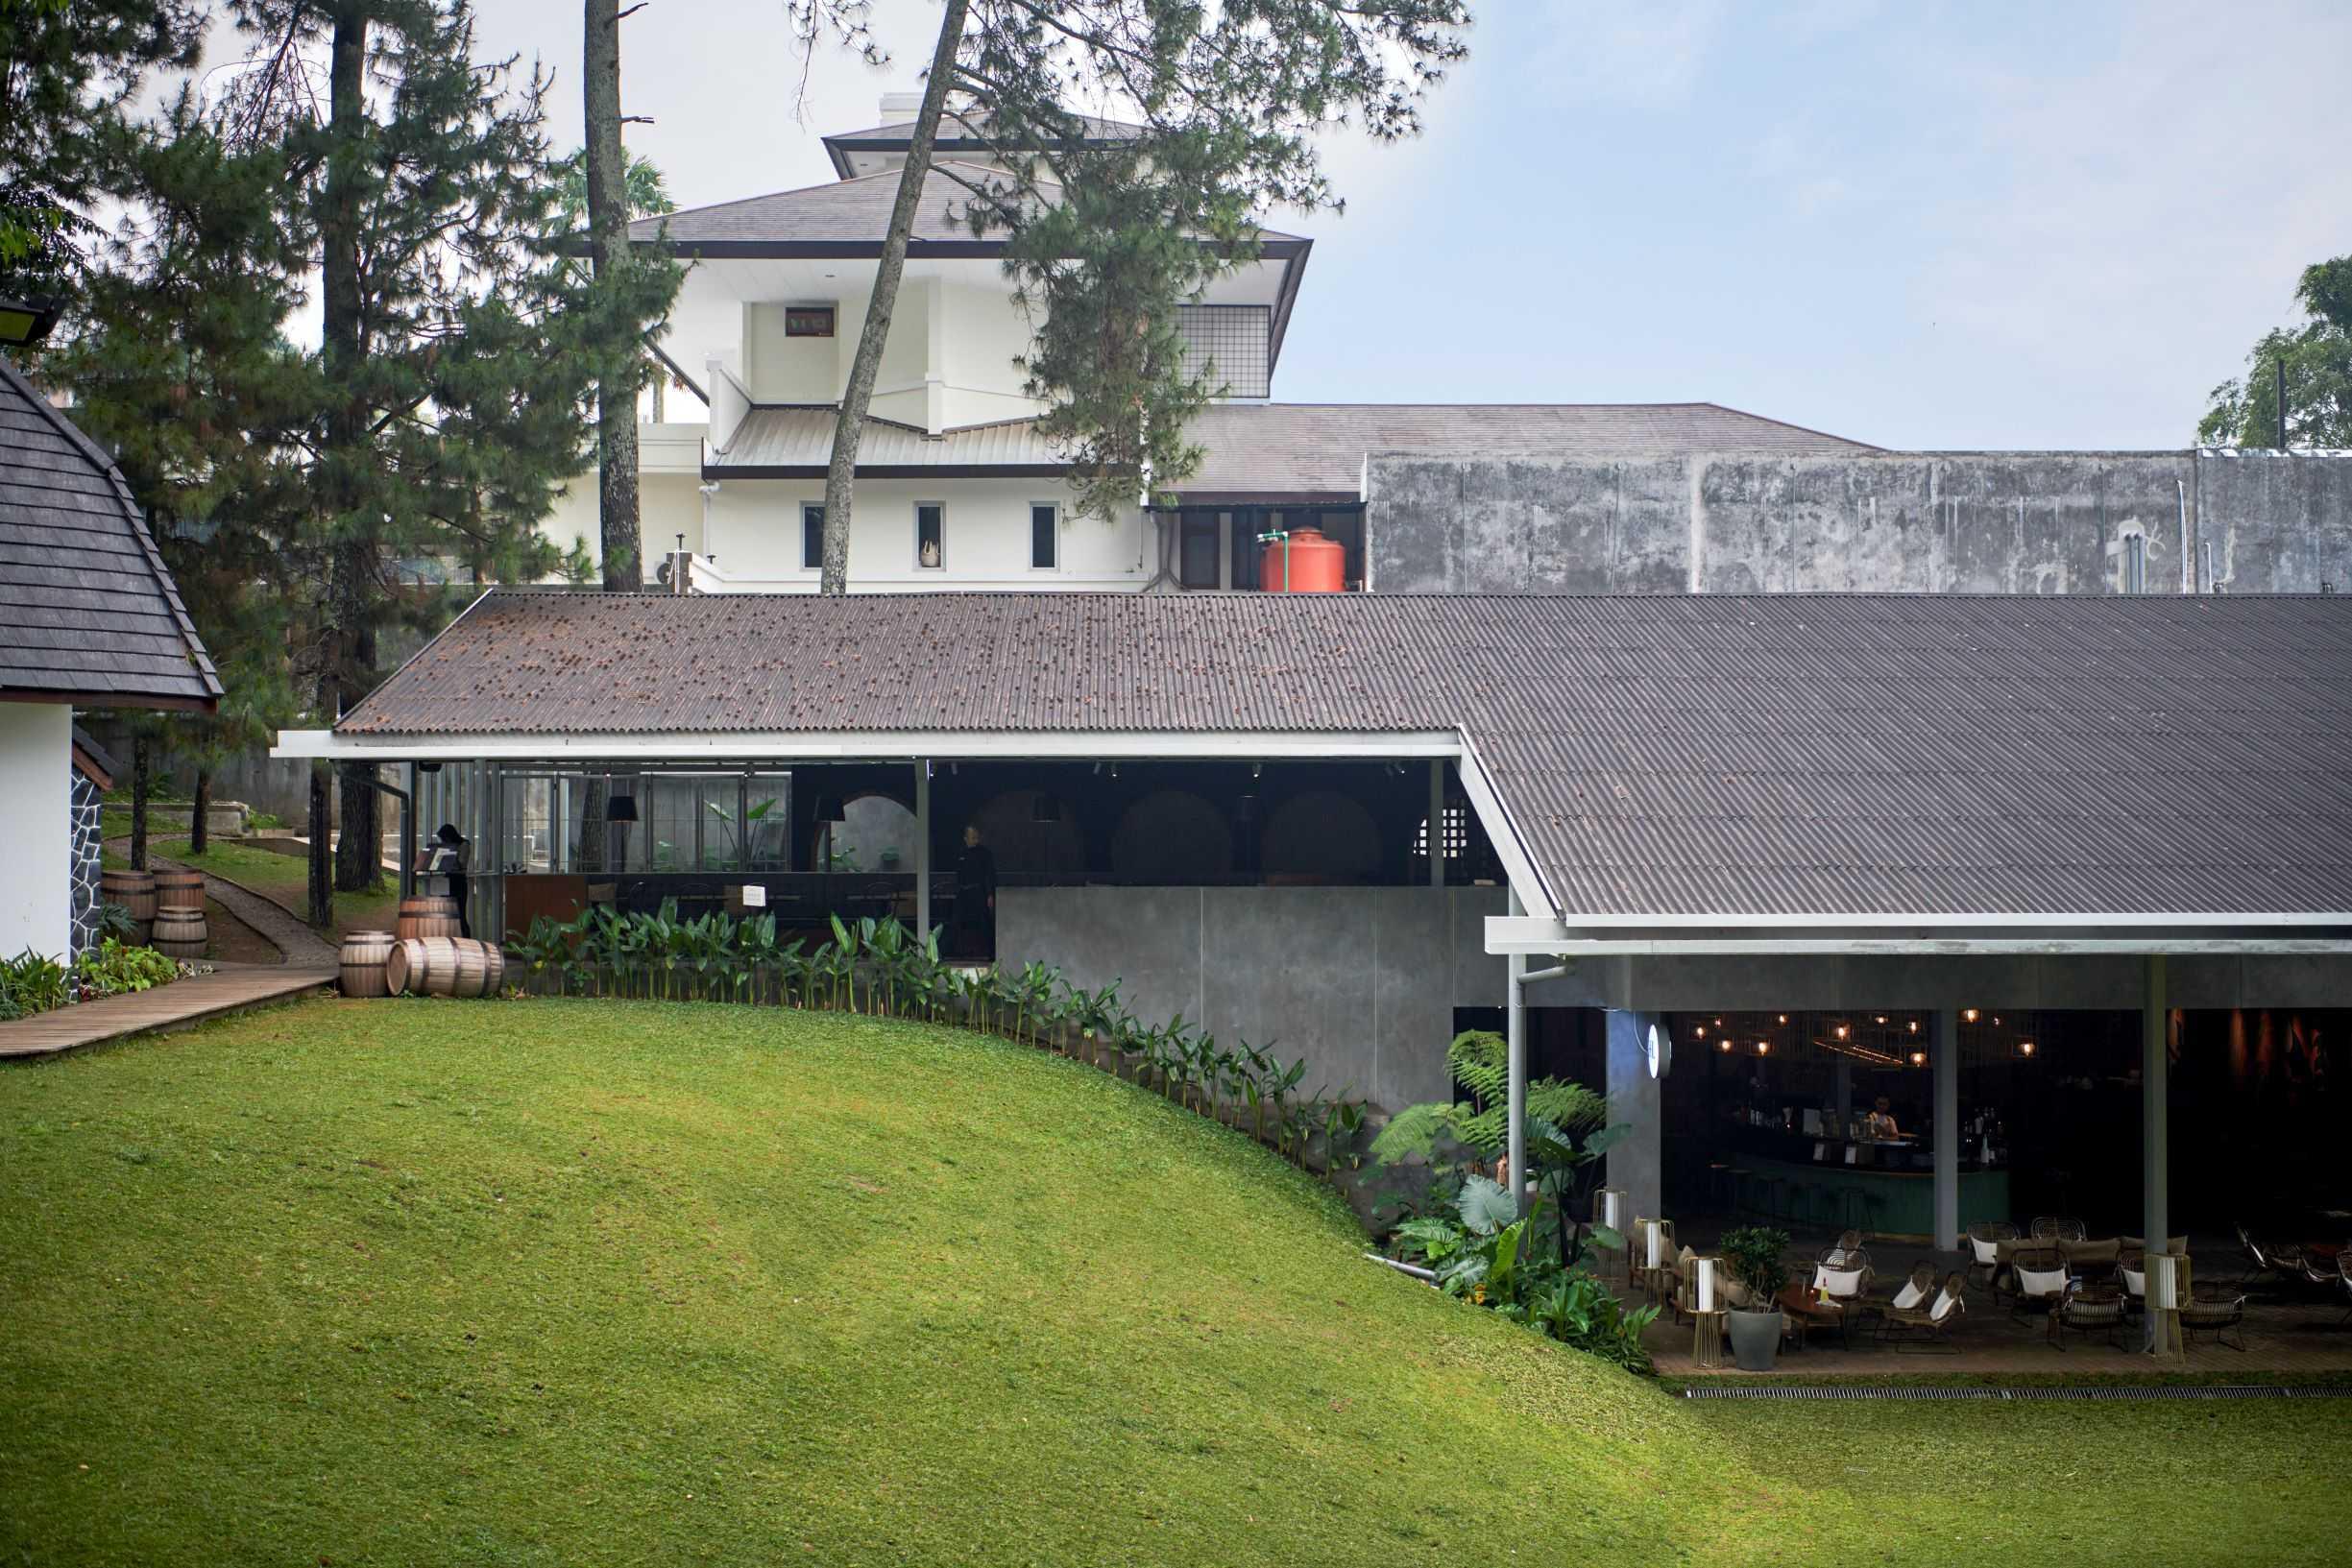 Hadivincent Architects Nara Park Ciumbuleuit, Cidadap, Kota Bandung, Jawa Barat, Indonesia Ciumbuleuit, Cidadap, Kota Bandung, Jawa Barat, Indonesia Hadivincent-Architects-Nara-Park   71550